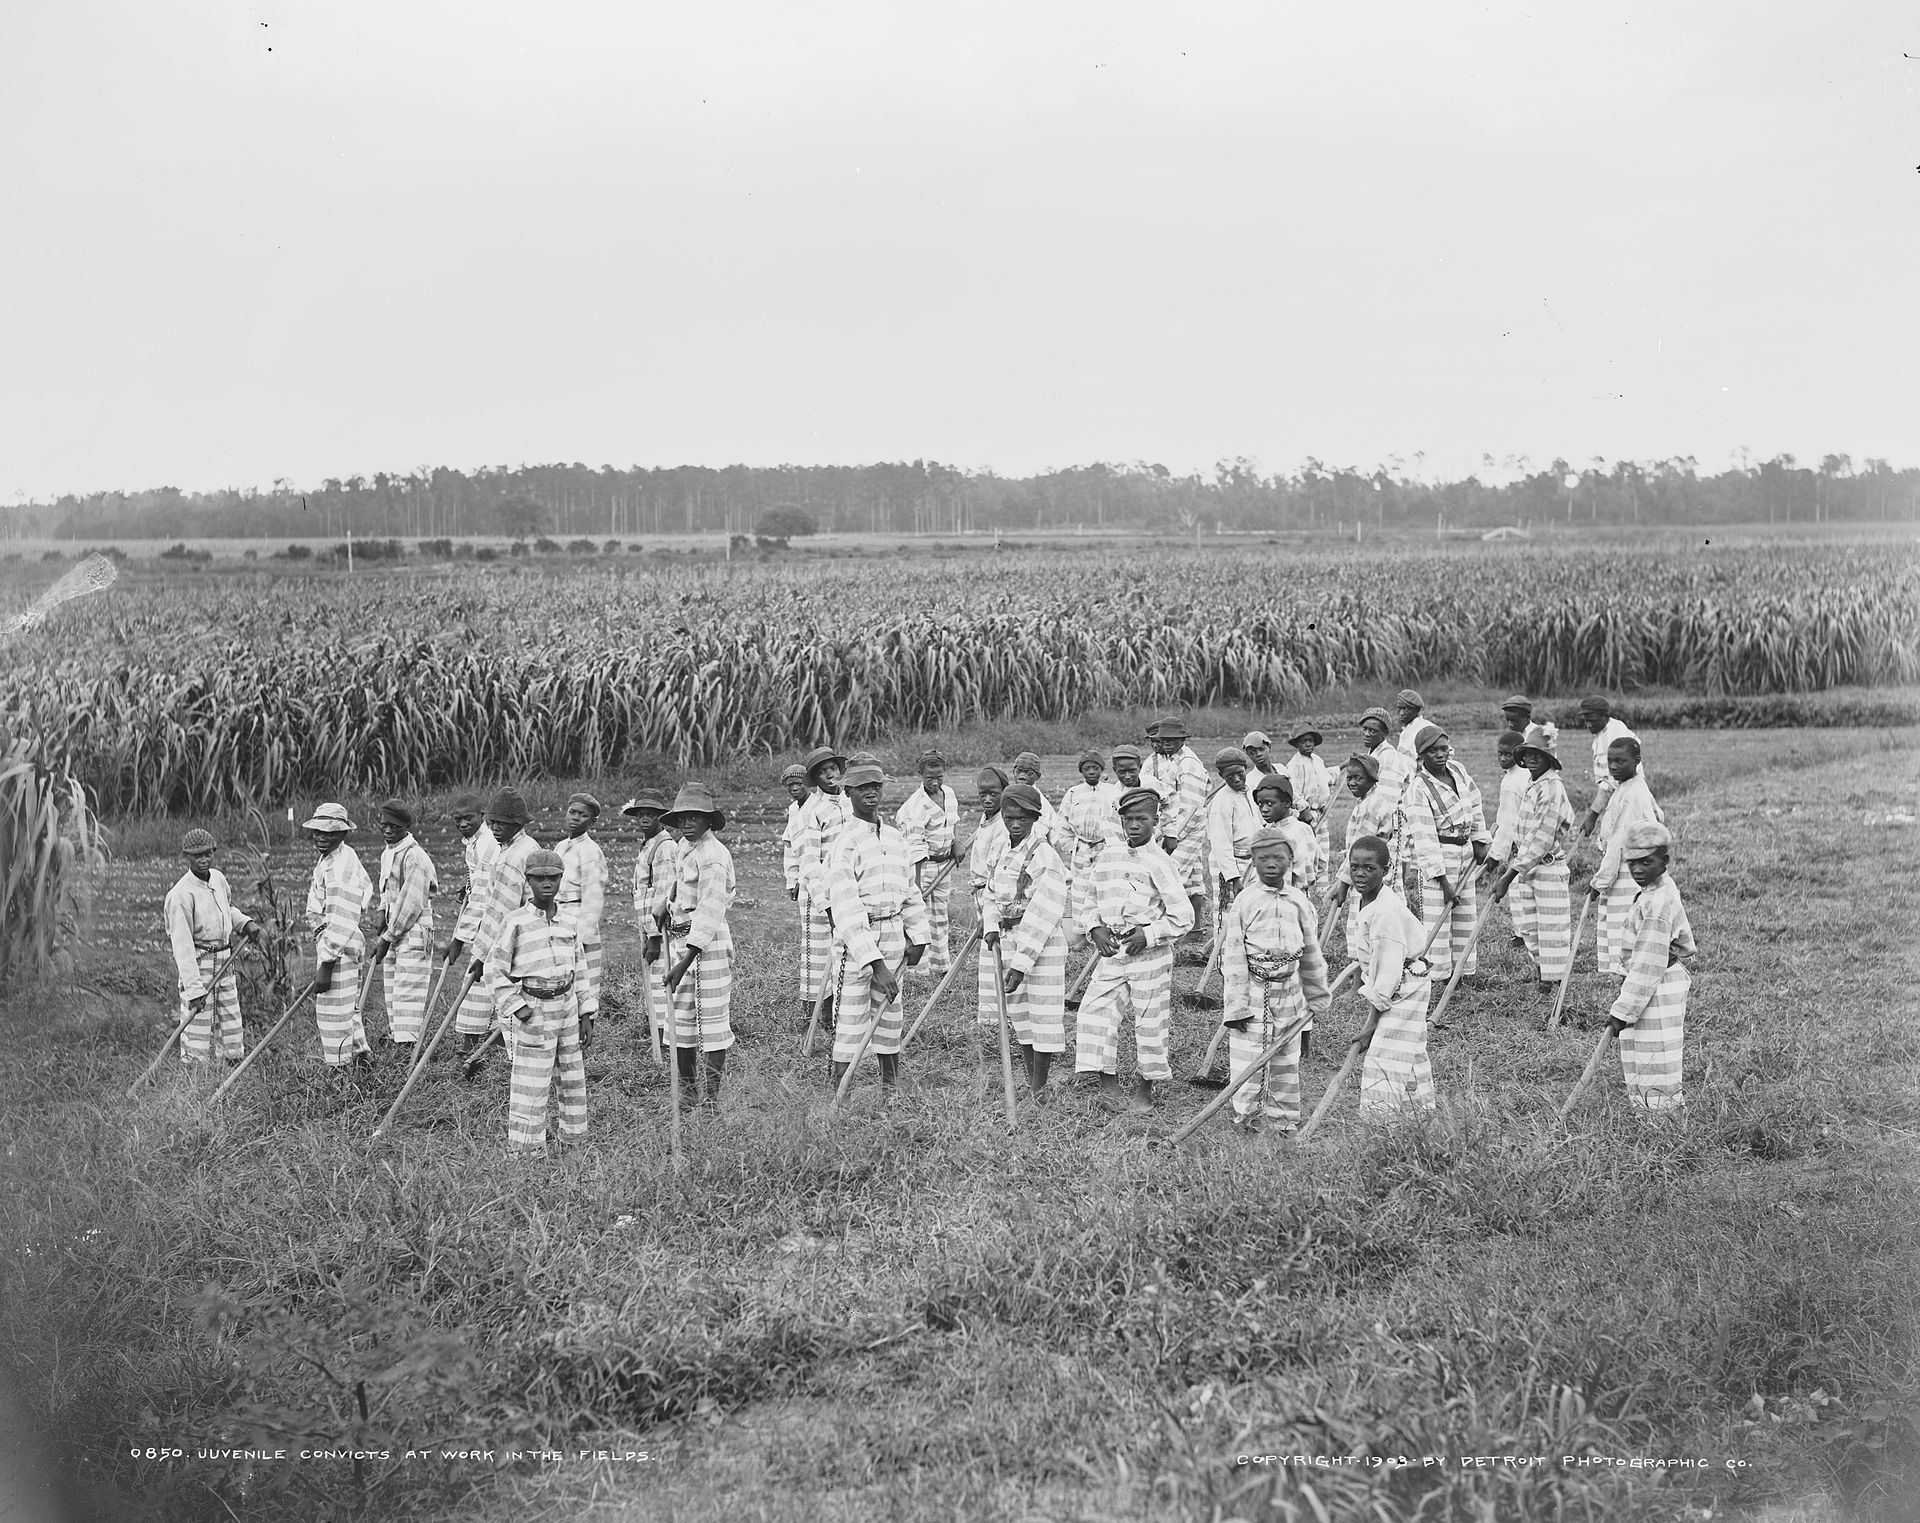 africanamerican civil rights movement 1896�1954 wikipedia